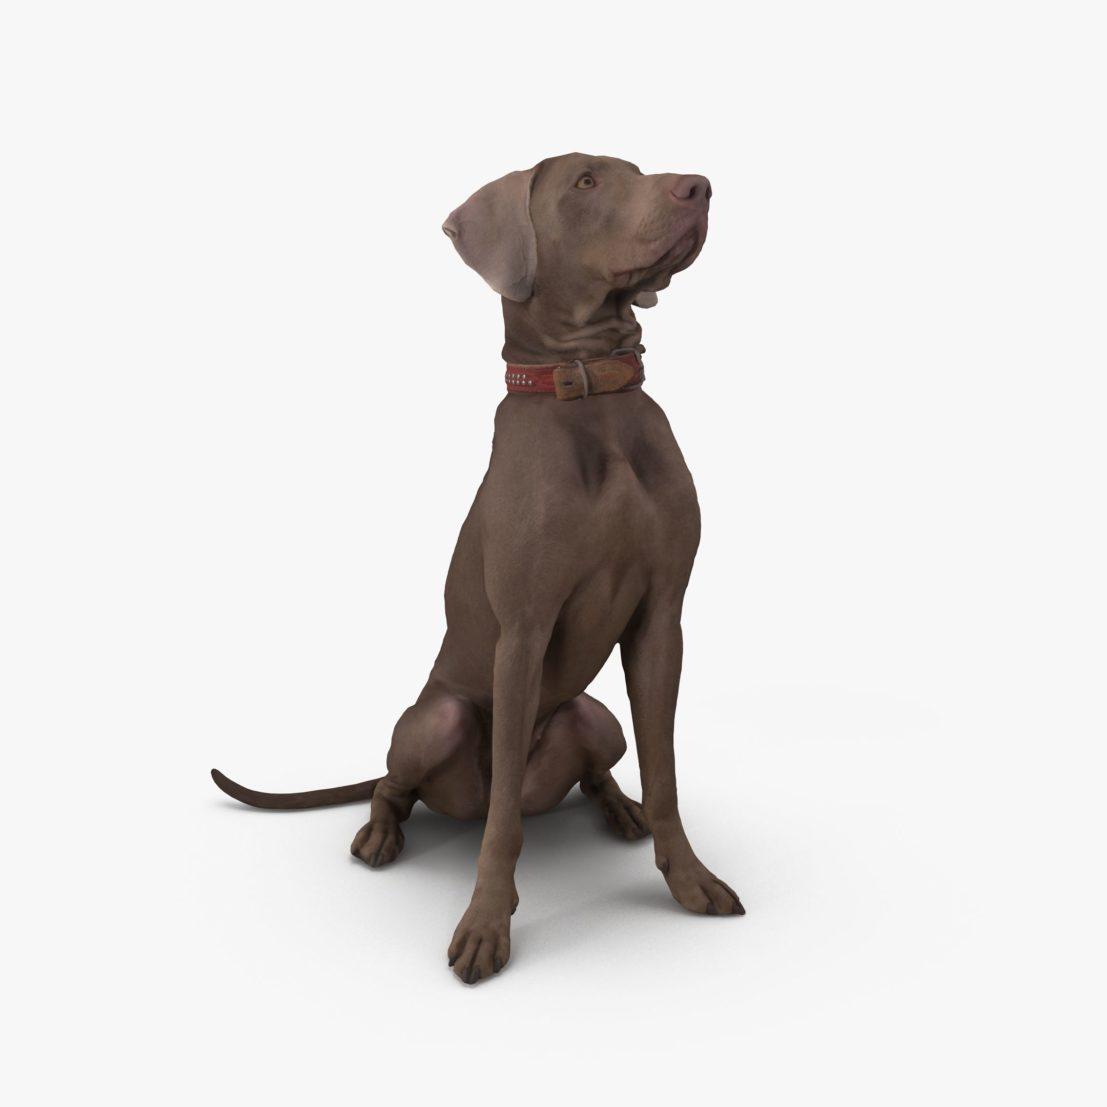 Weimaraner Sitting Dog 3D Model | 3DTree Scanning Studio